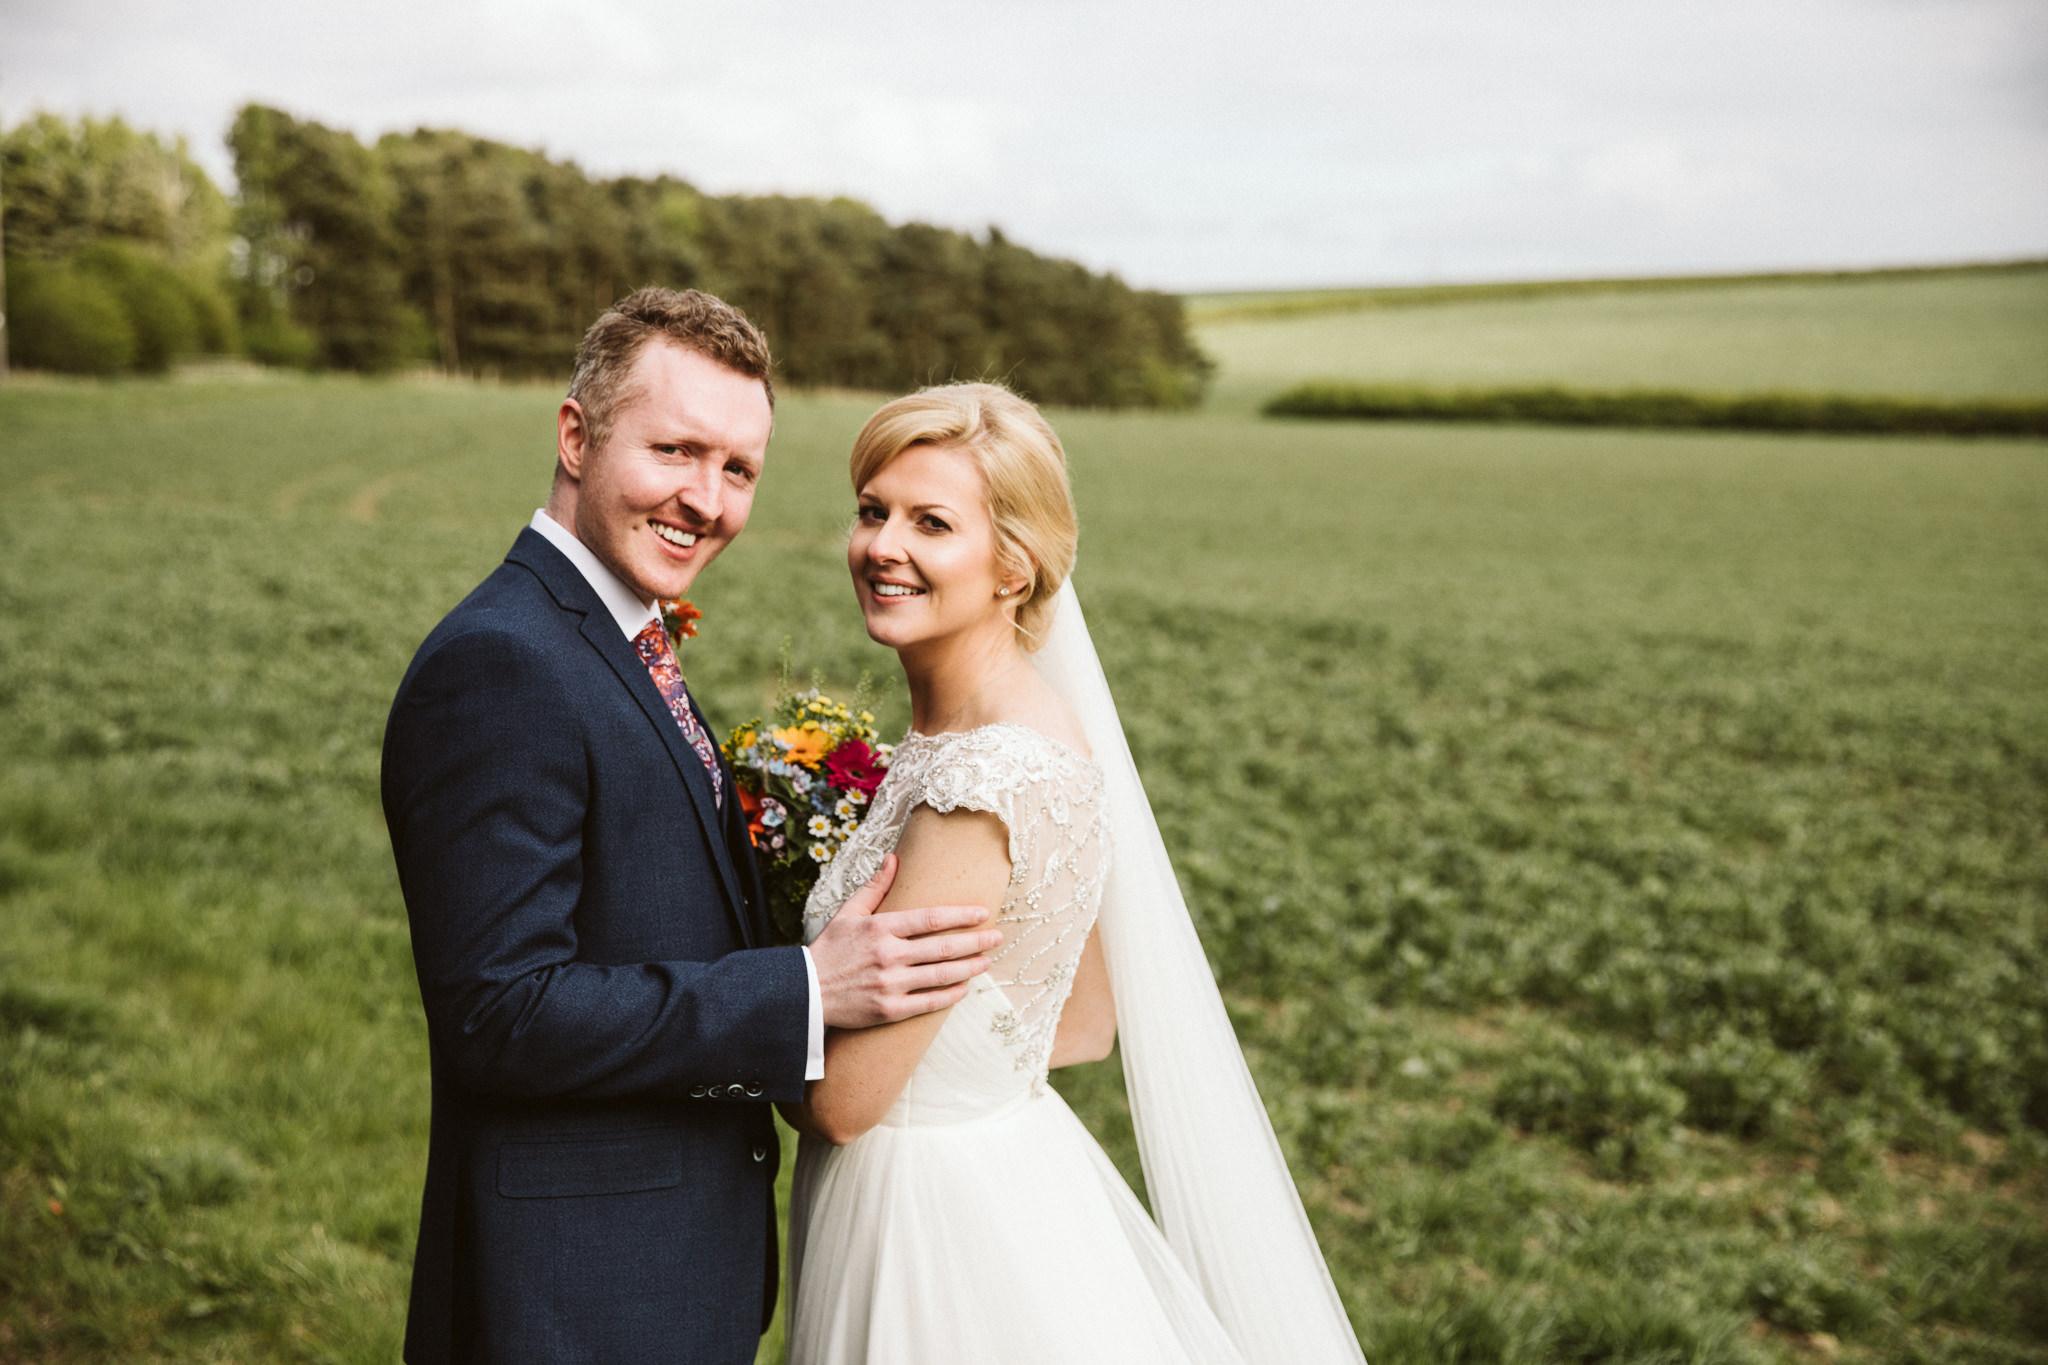 northside-farm-wedding-northumberland-margarita-hope (78).jpg